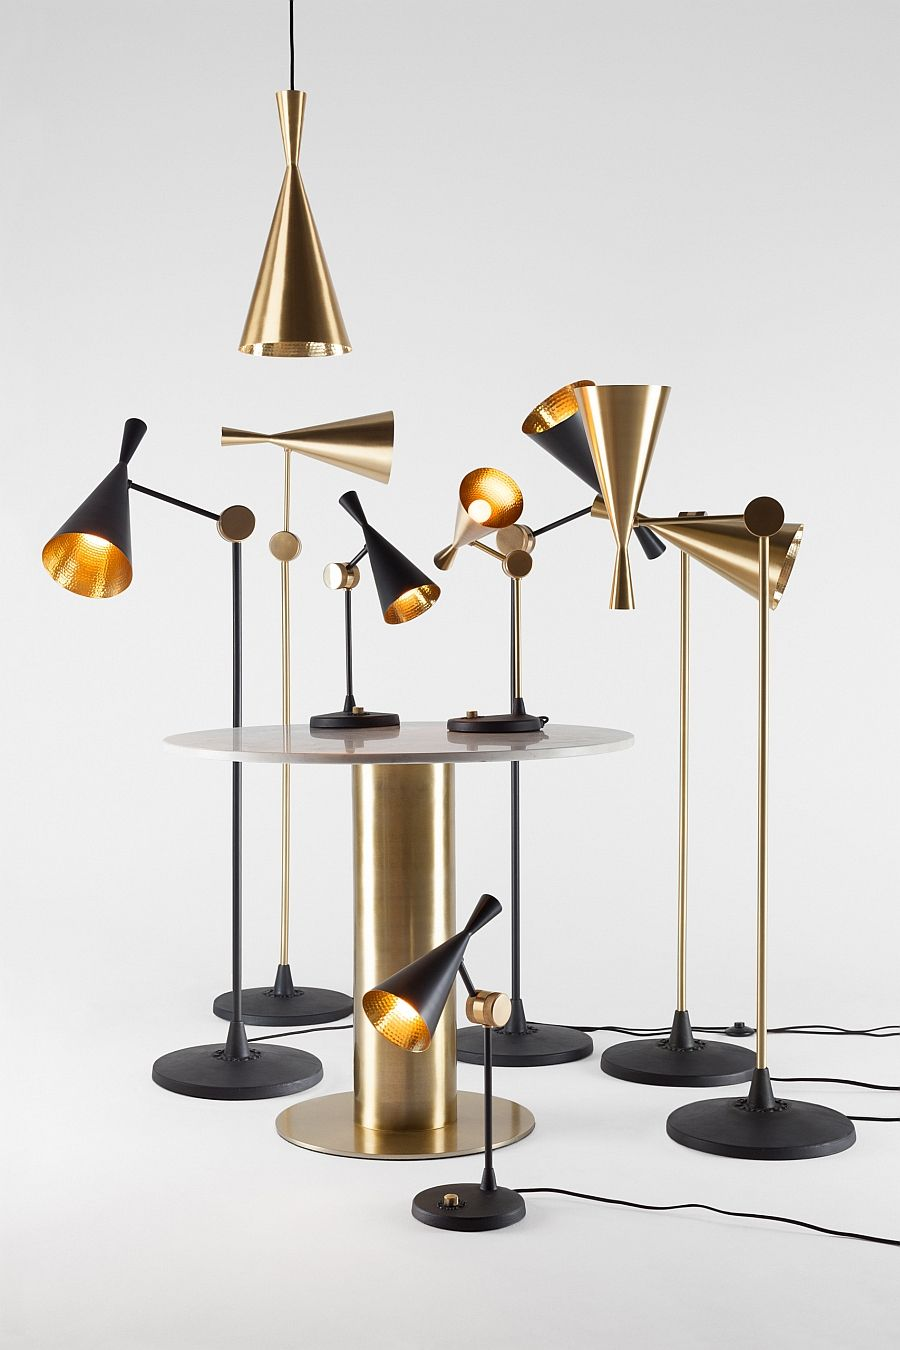 Tom Dixon Lighting Decor Beat Flood Plane And Pivot Adjustable Floor Lamp Tom Dixon Lighting Lamp Design